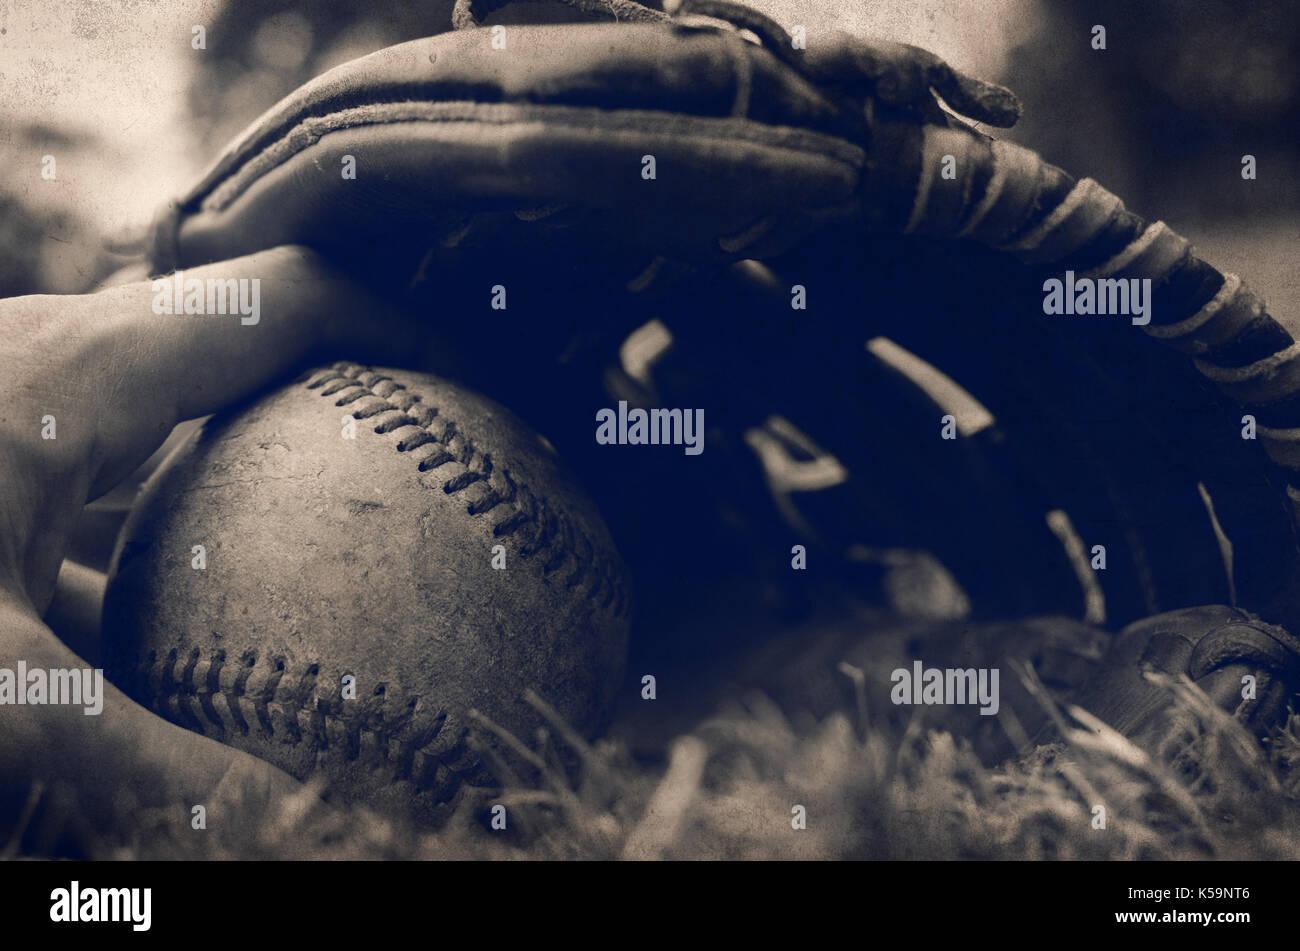 Vintage Baseball Imágenes De Stock & Vintage Baseball Fotos De Stock ...